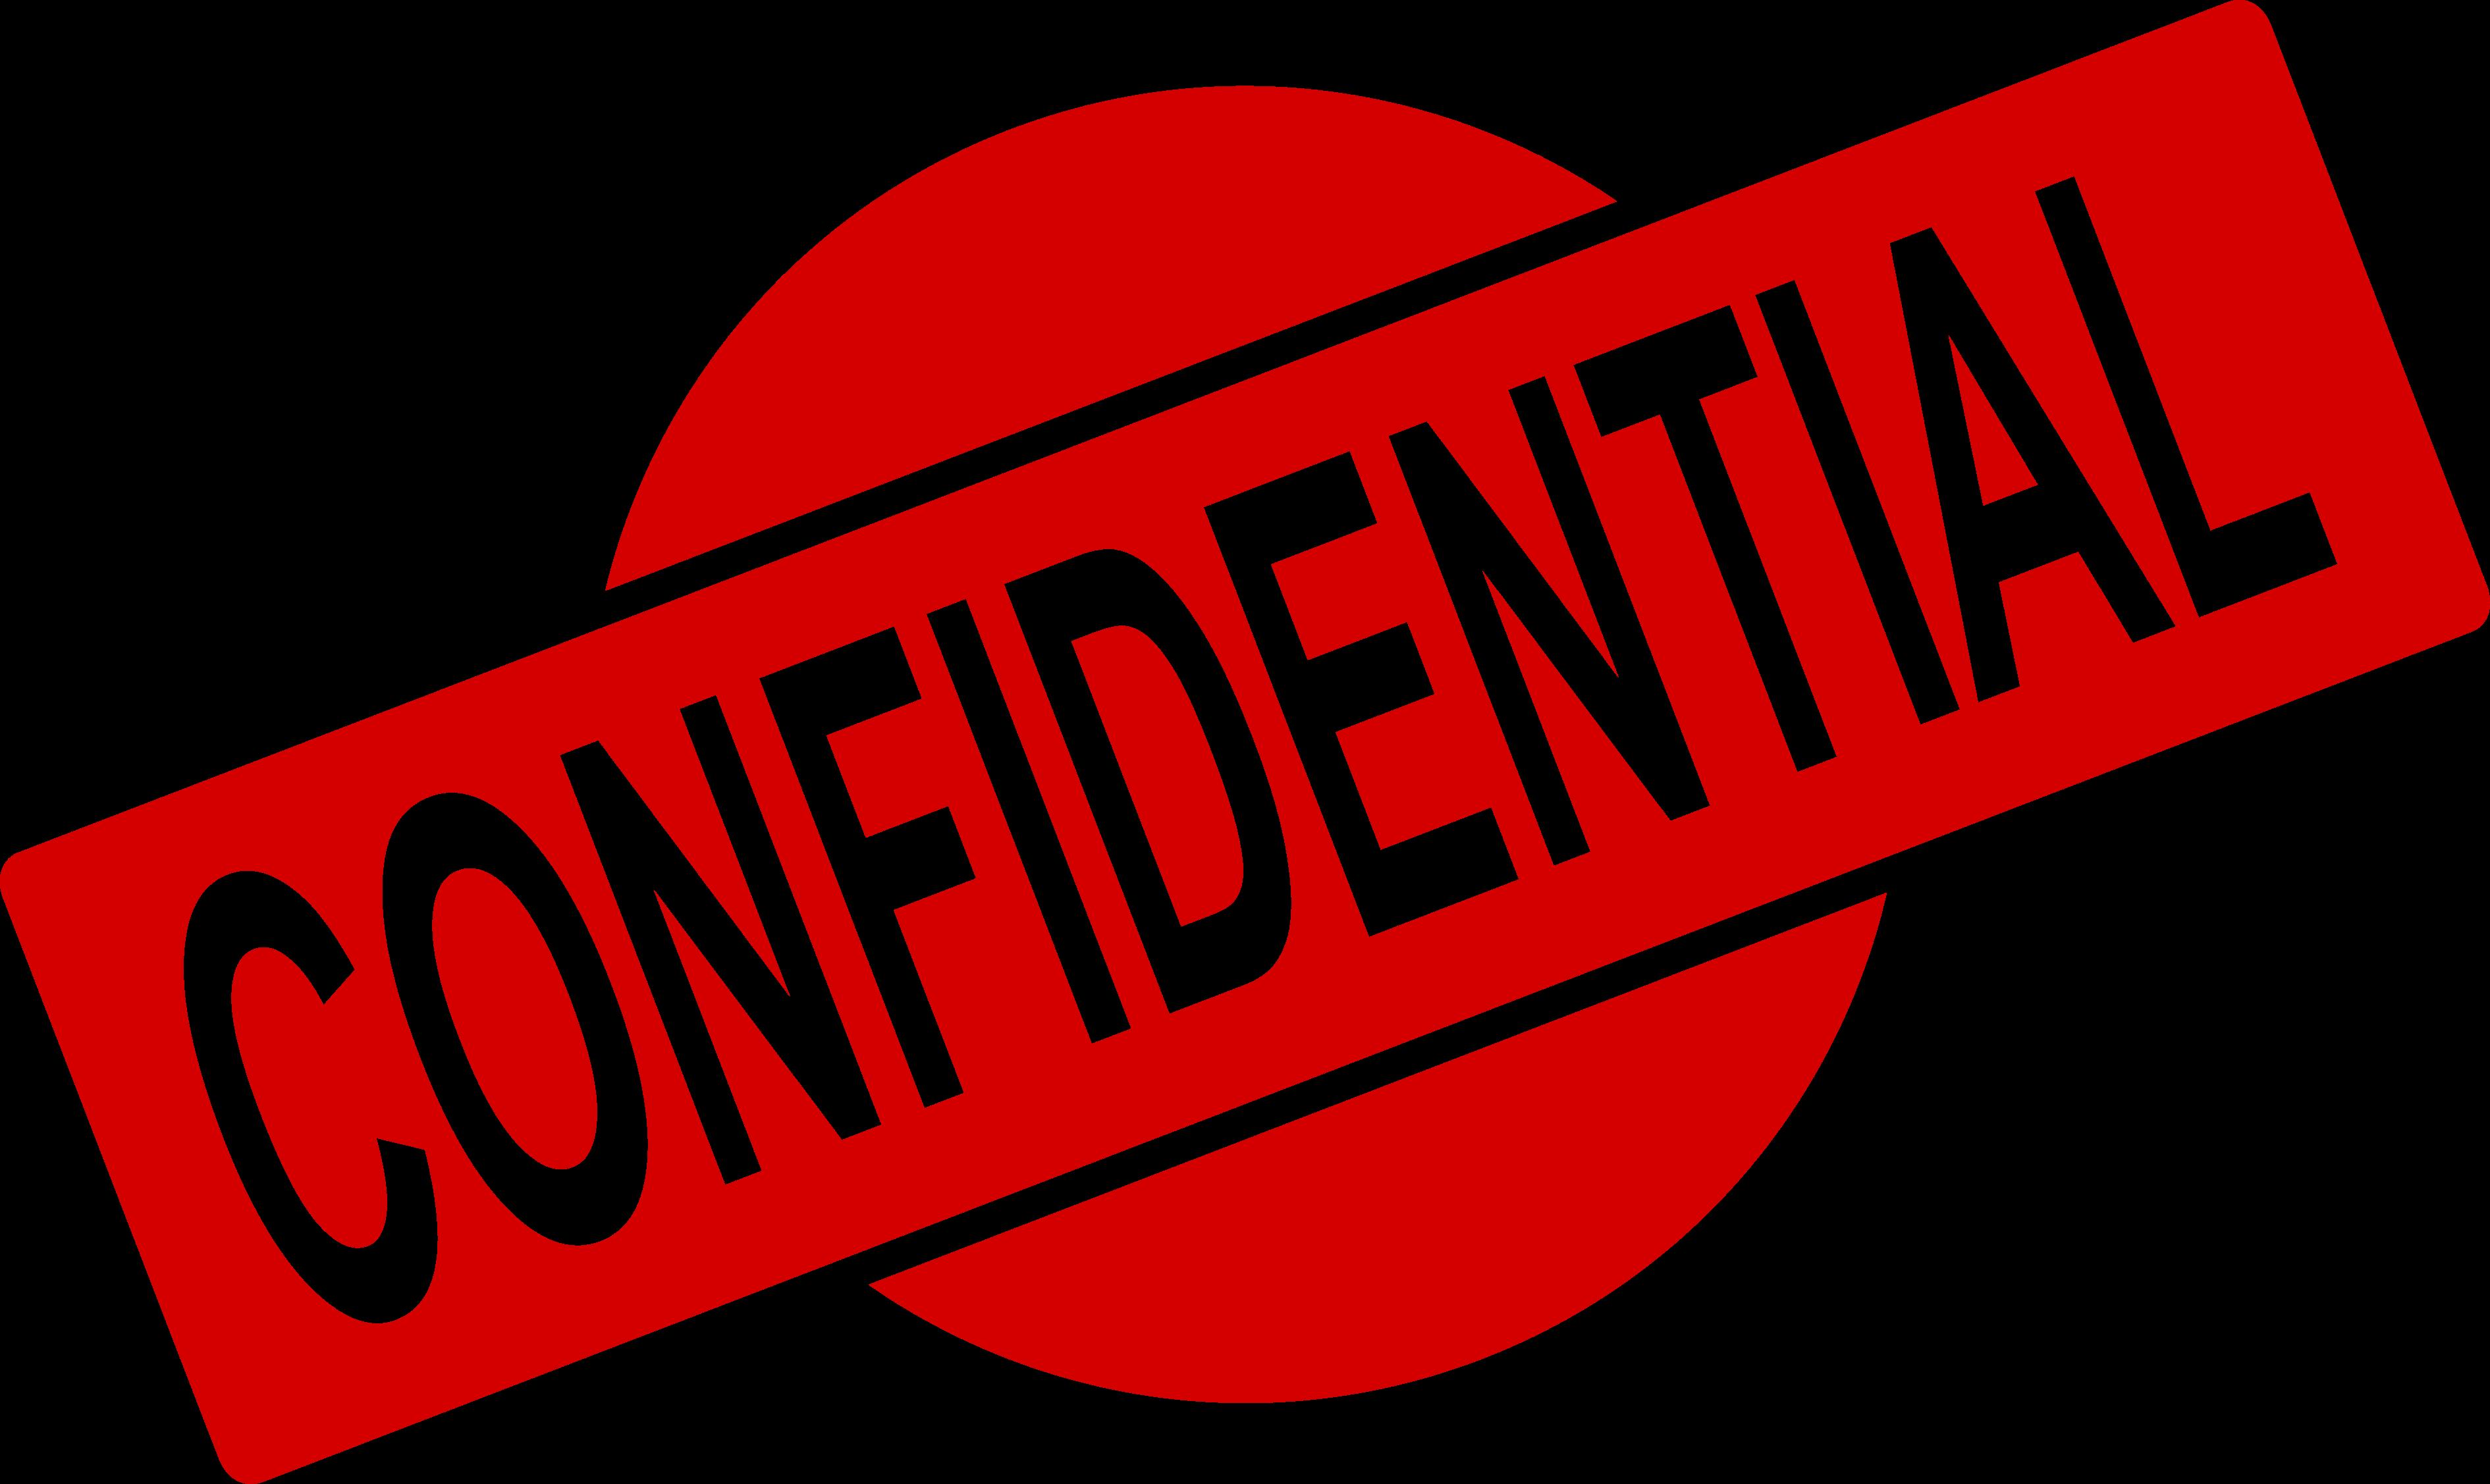 4 Confidential Stamp (PNG Transparent).